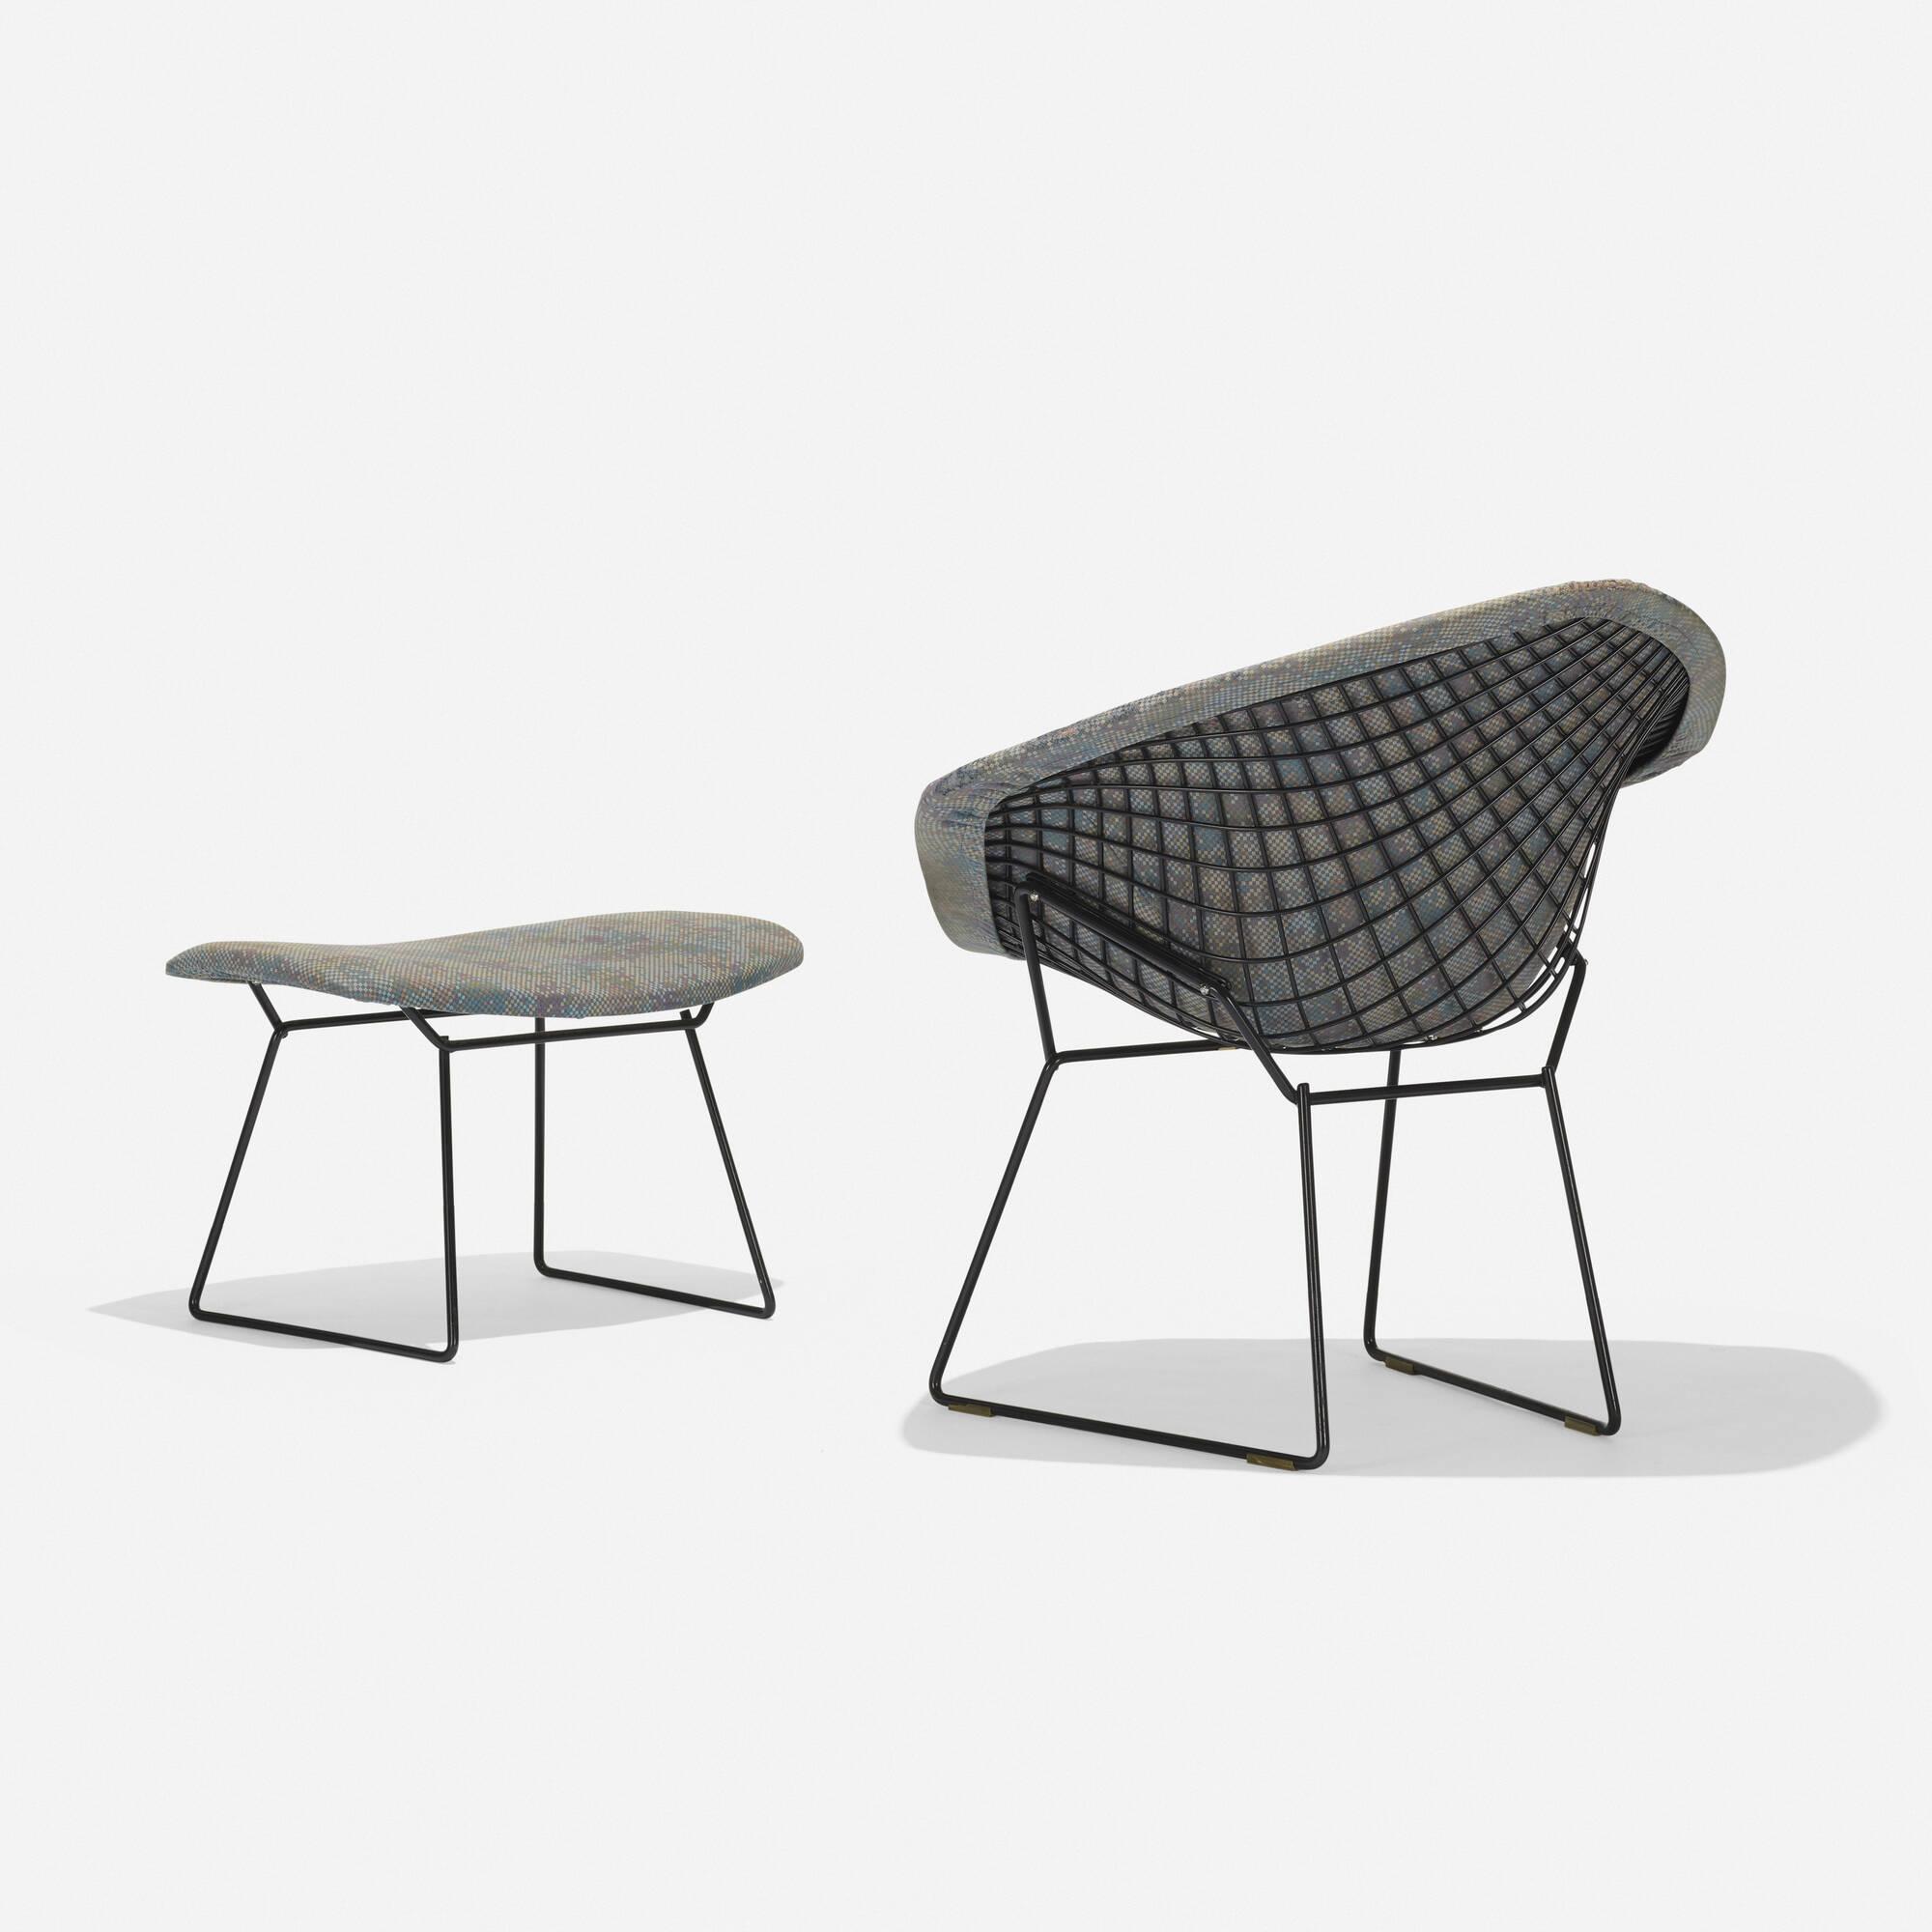 330: Harry Bertoia / Diamond Chair And Ottoman (1 Of 3)